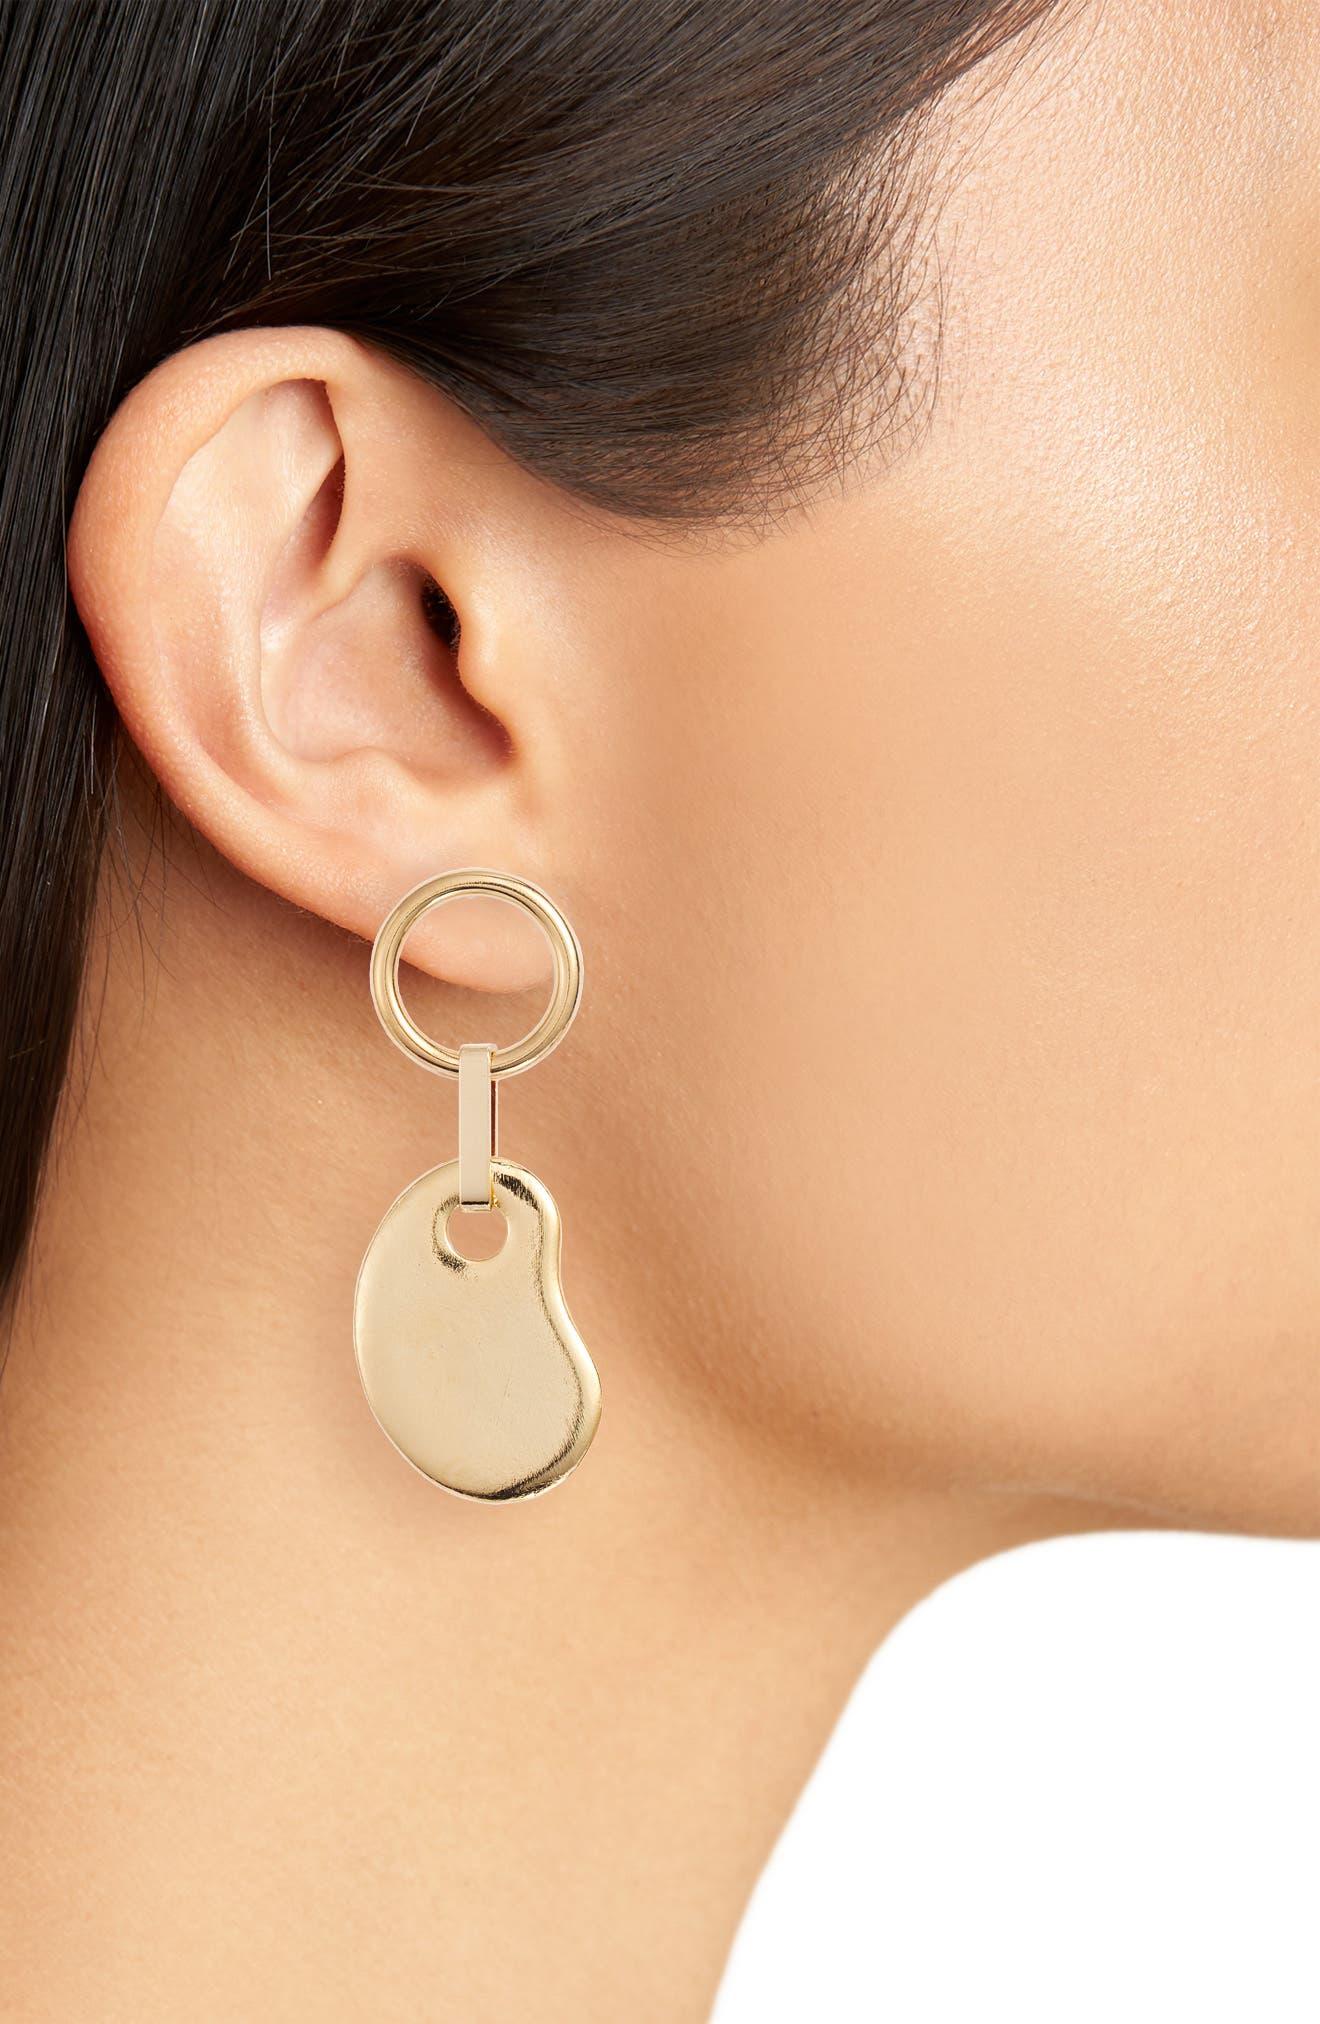 Amoeba Ring Drop Earrings,                             Alternate thumbnail 2, color,                             Gold